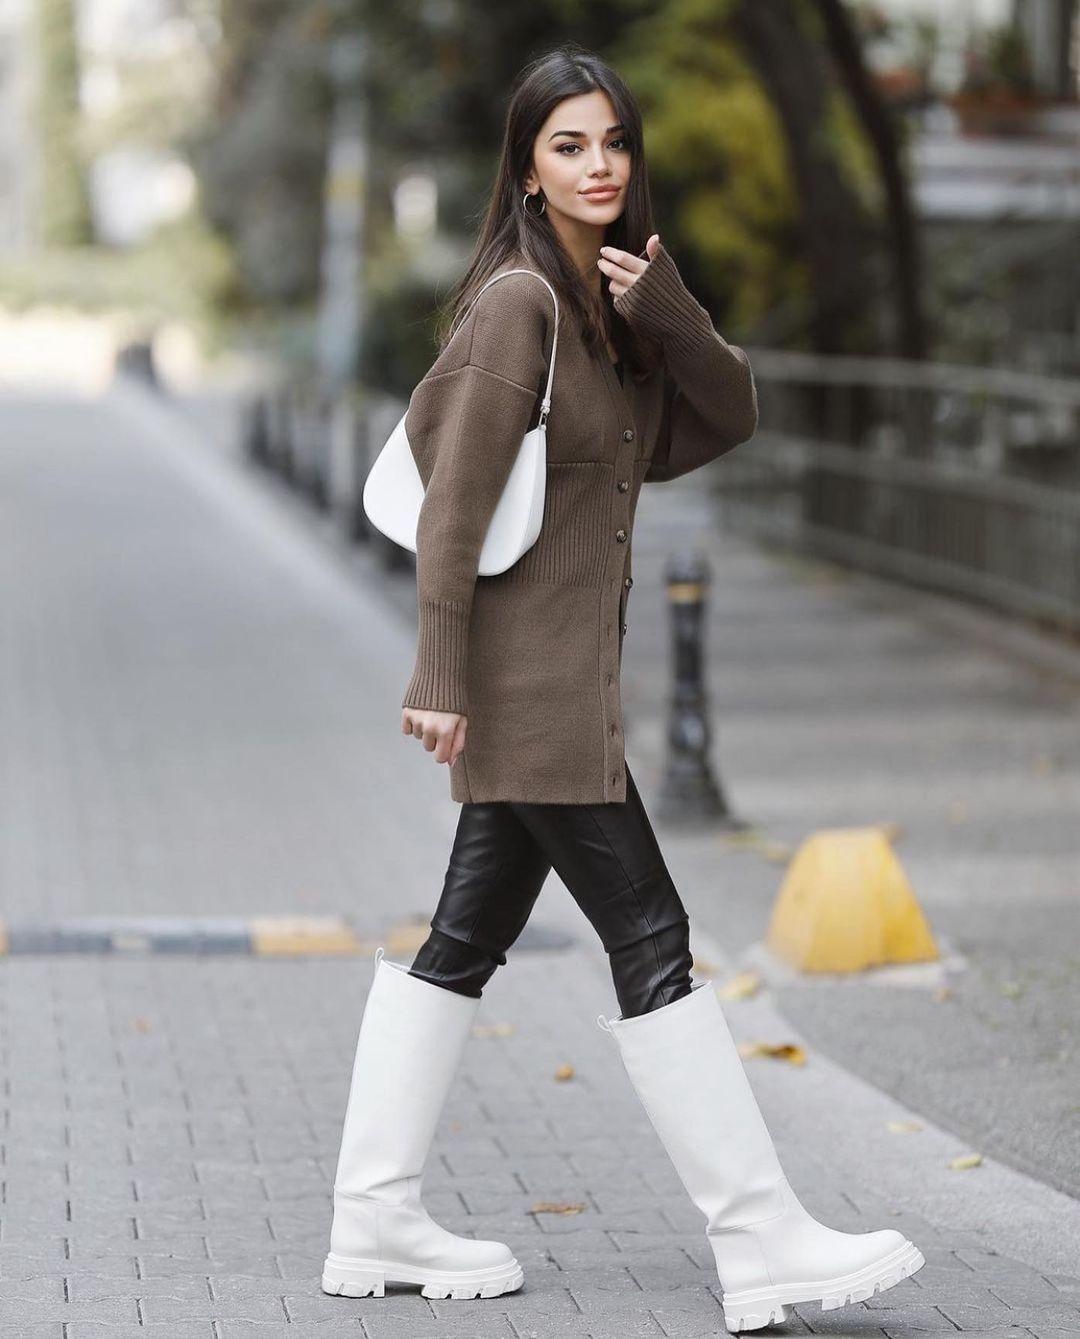 rain boots with transparent sole de Zara sur zarastreetstyle